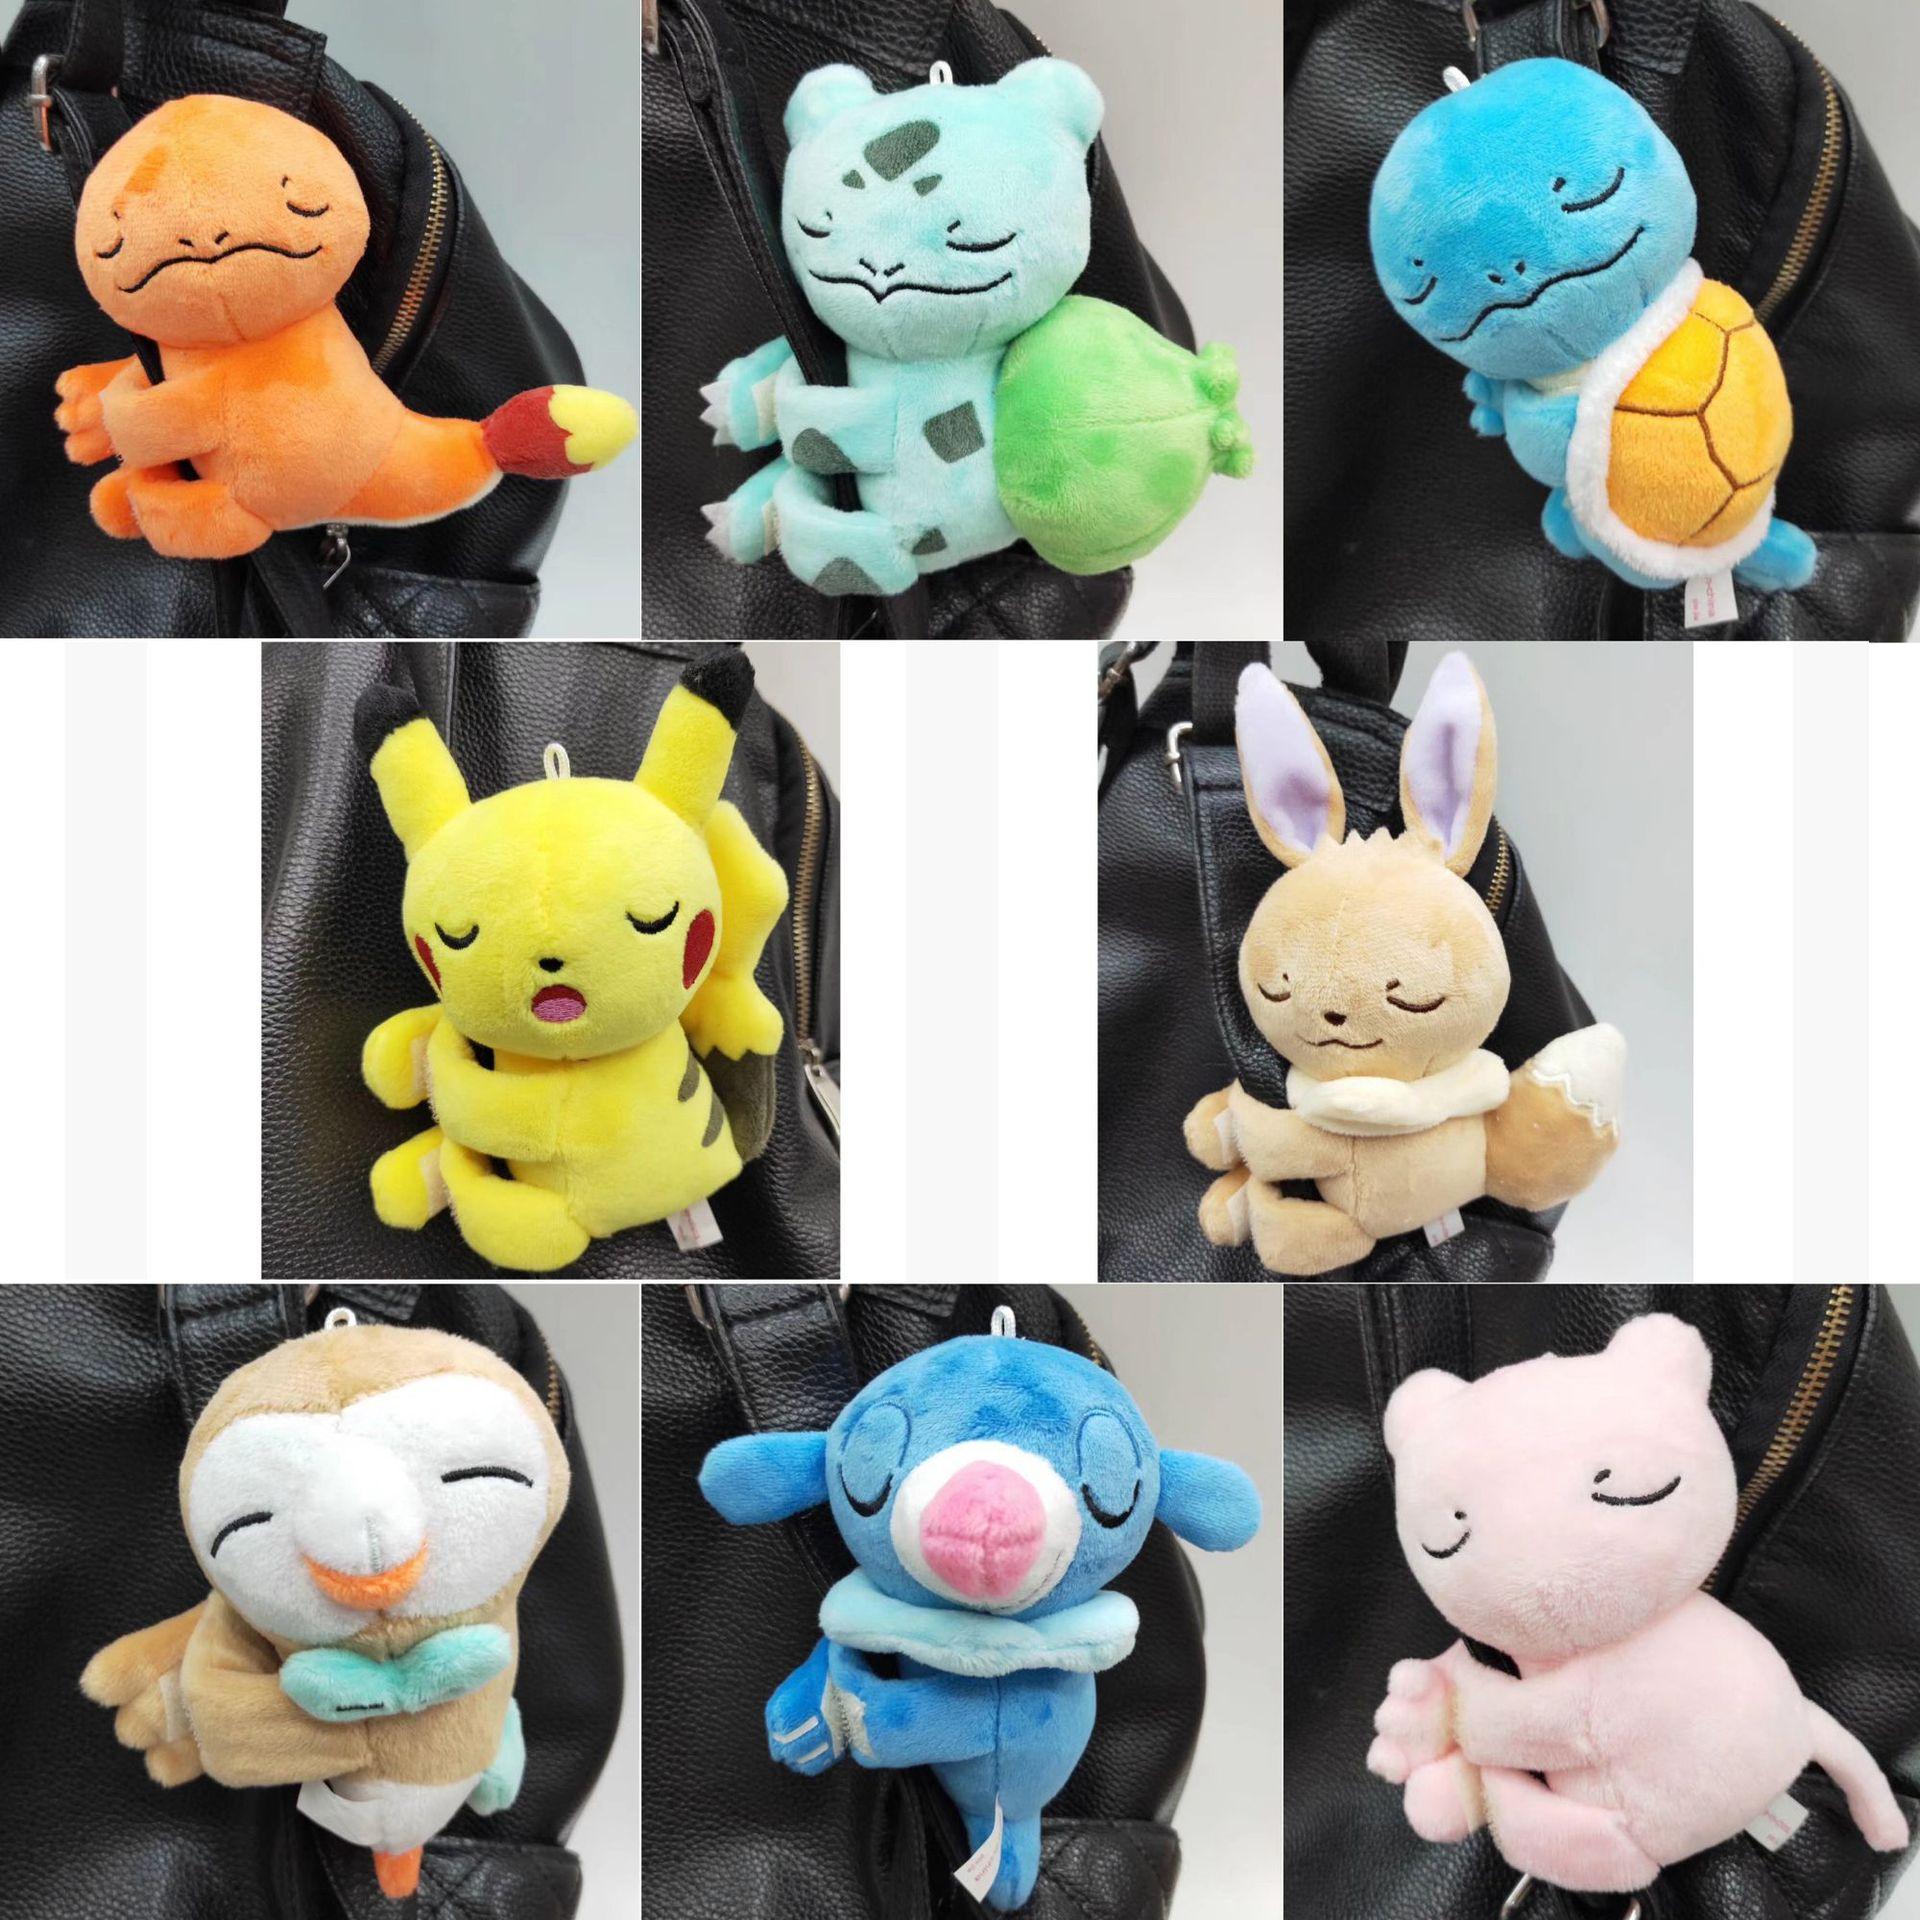 tv movie character toys new pokemon